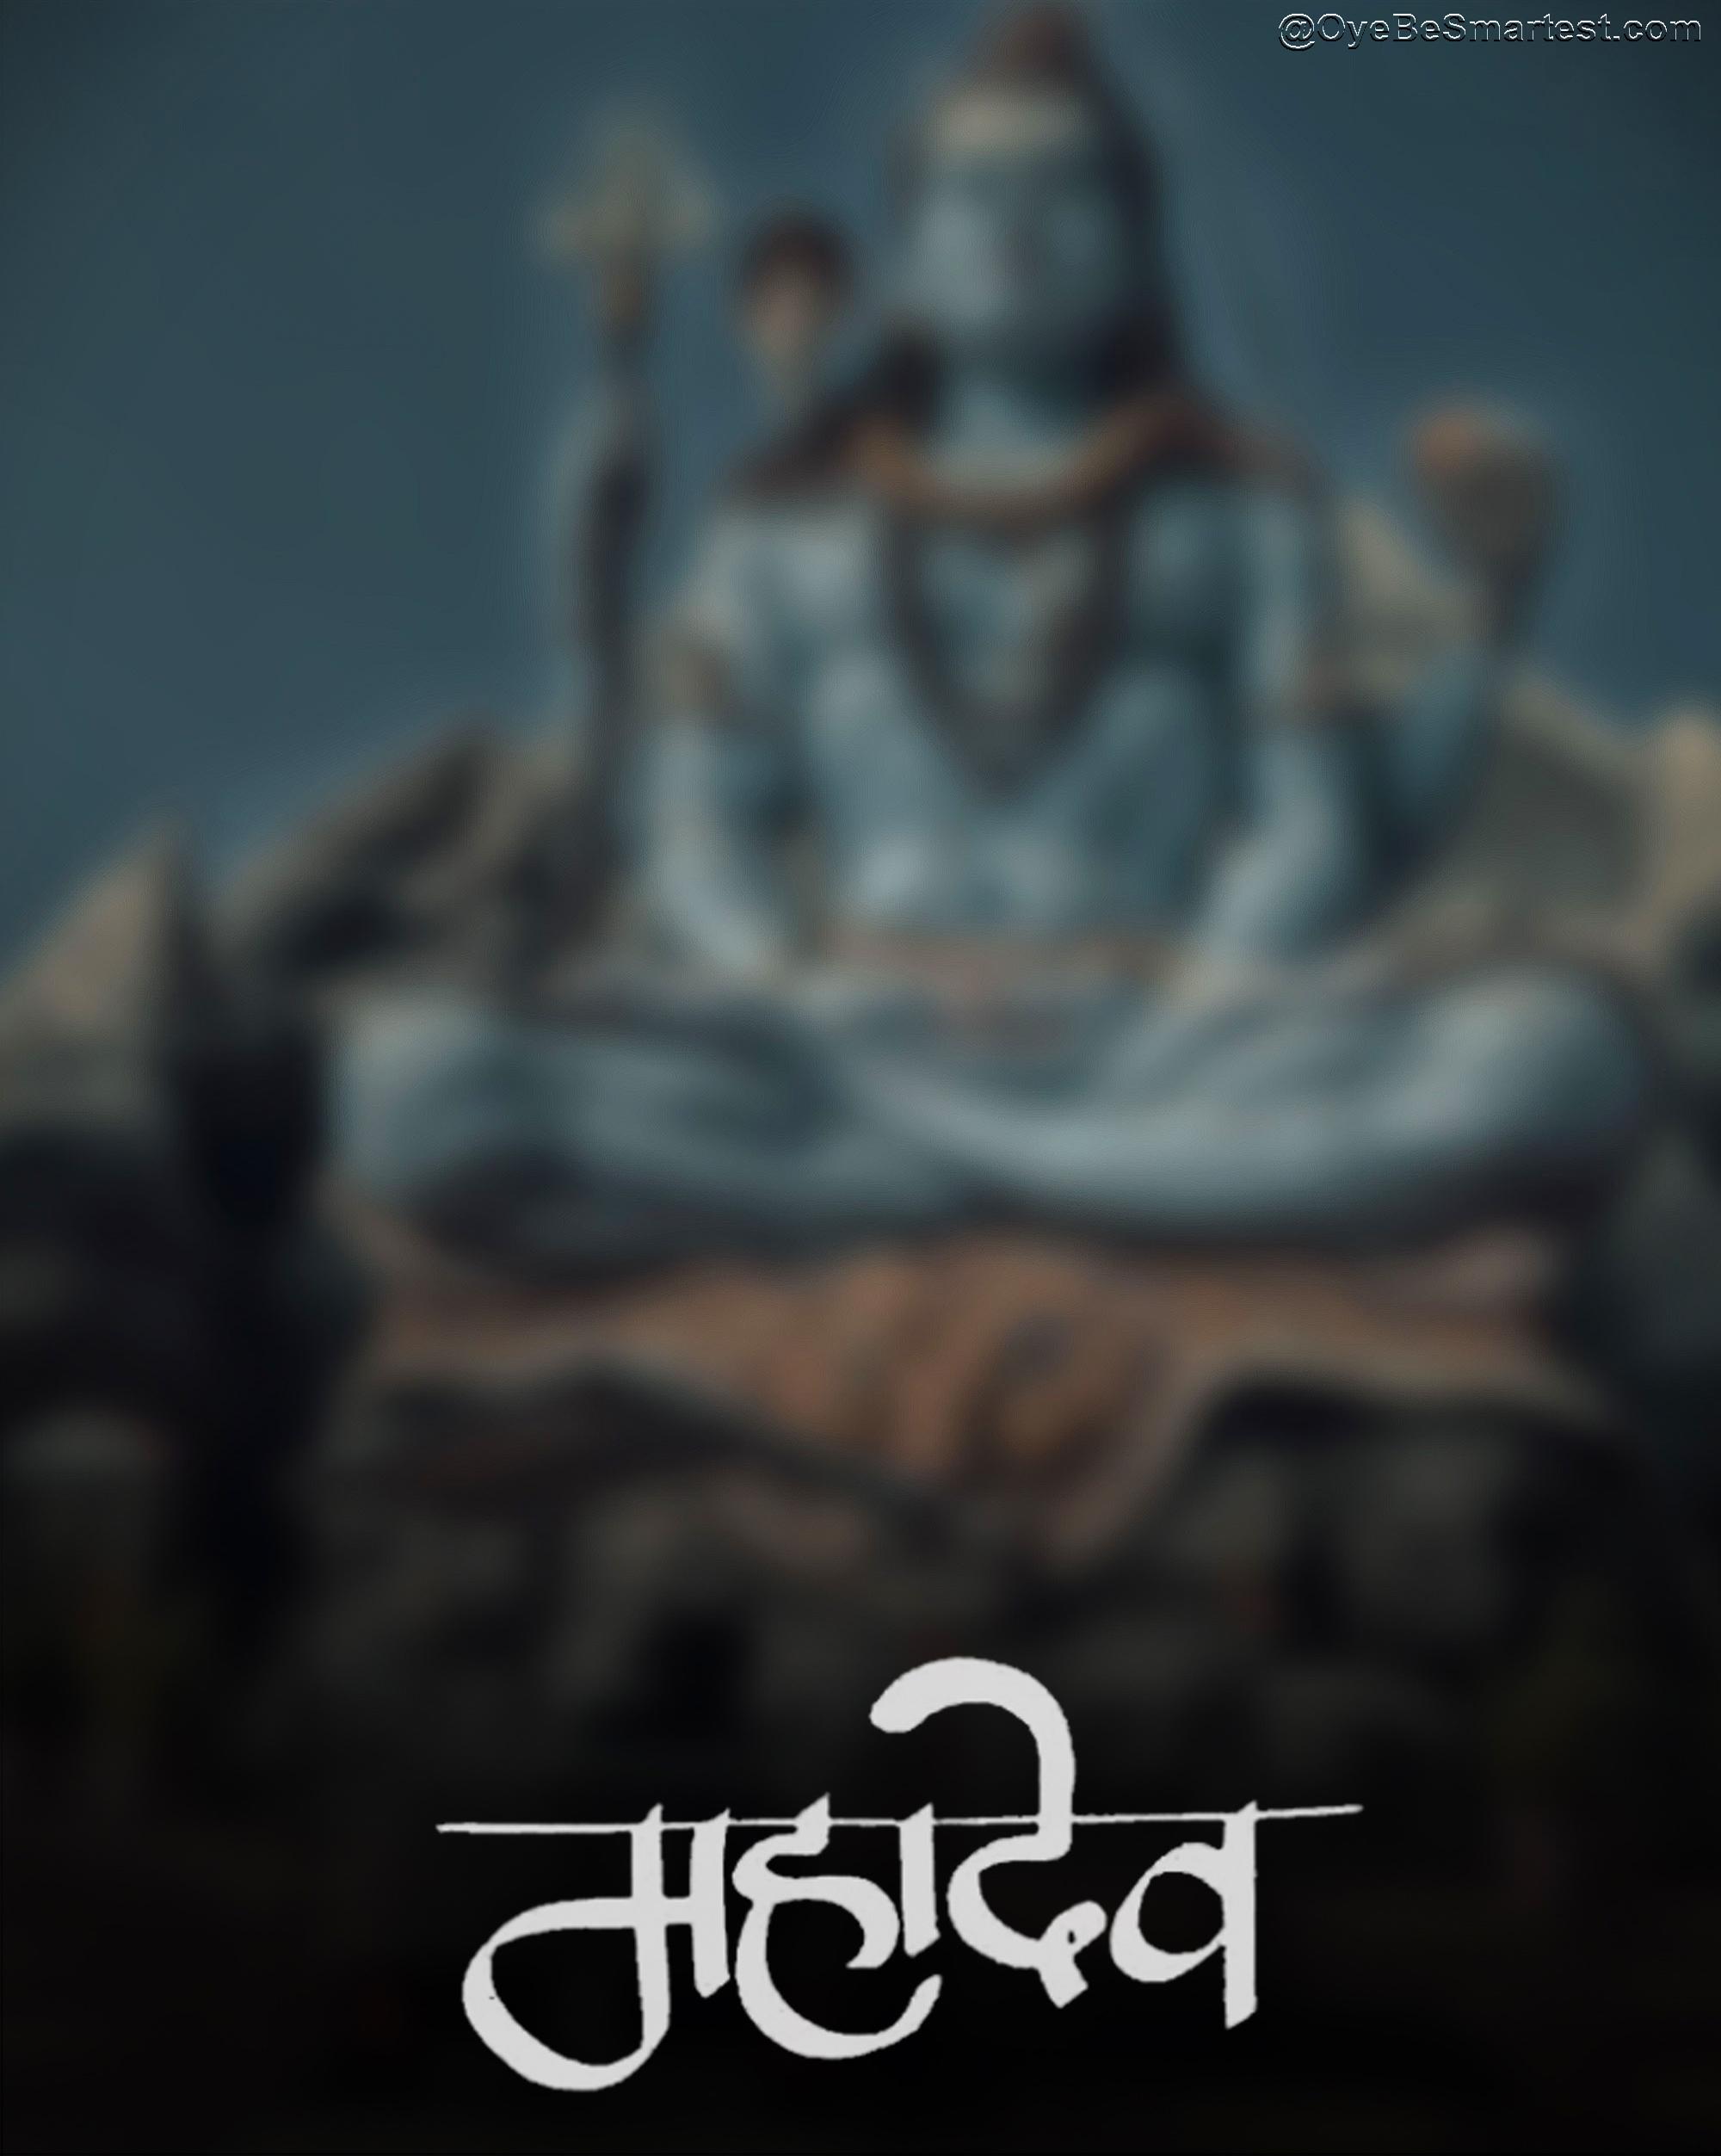 maha shivratri editing backgrounds 7